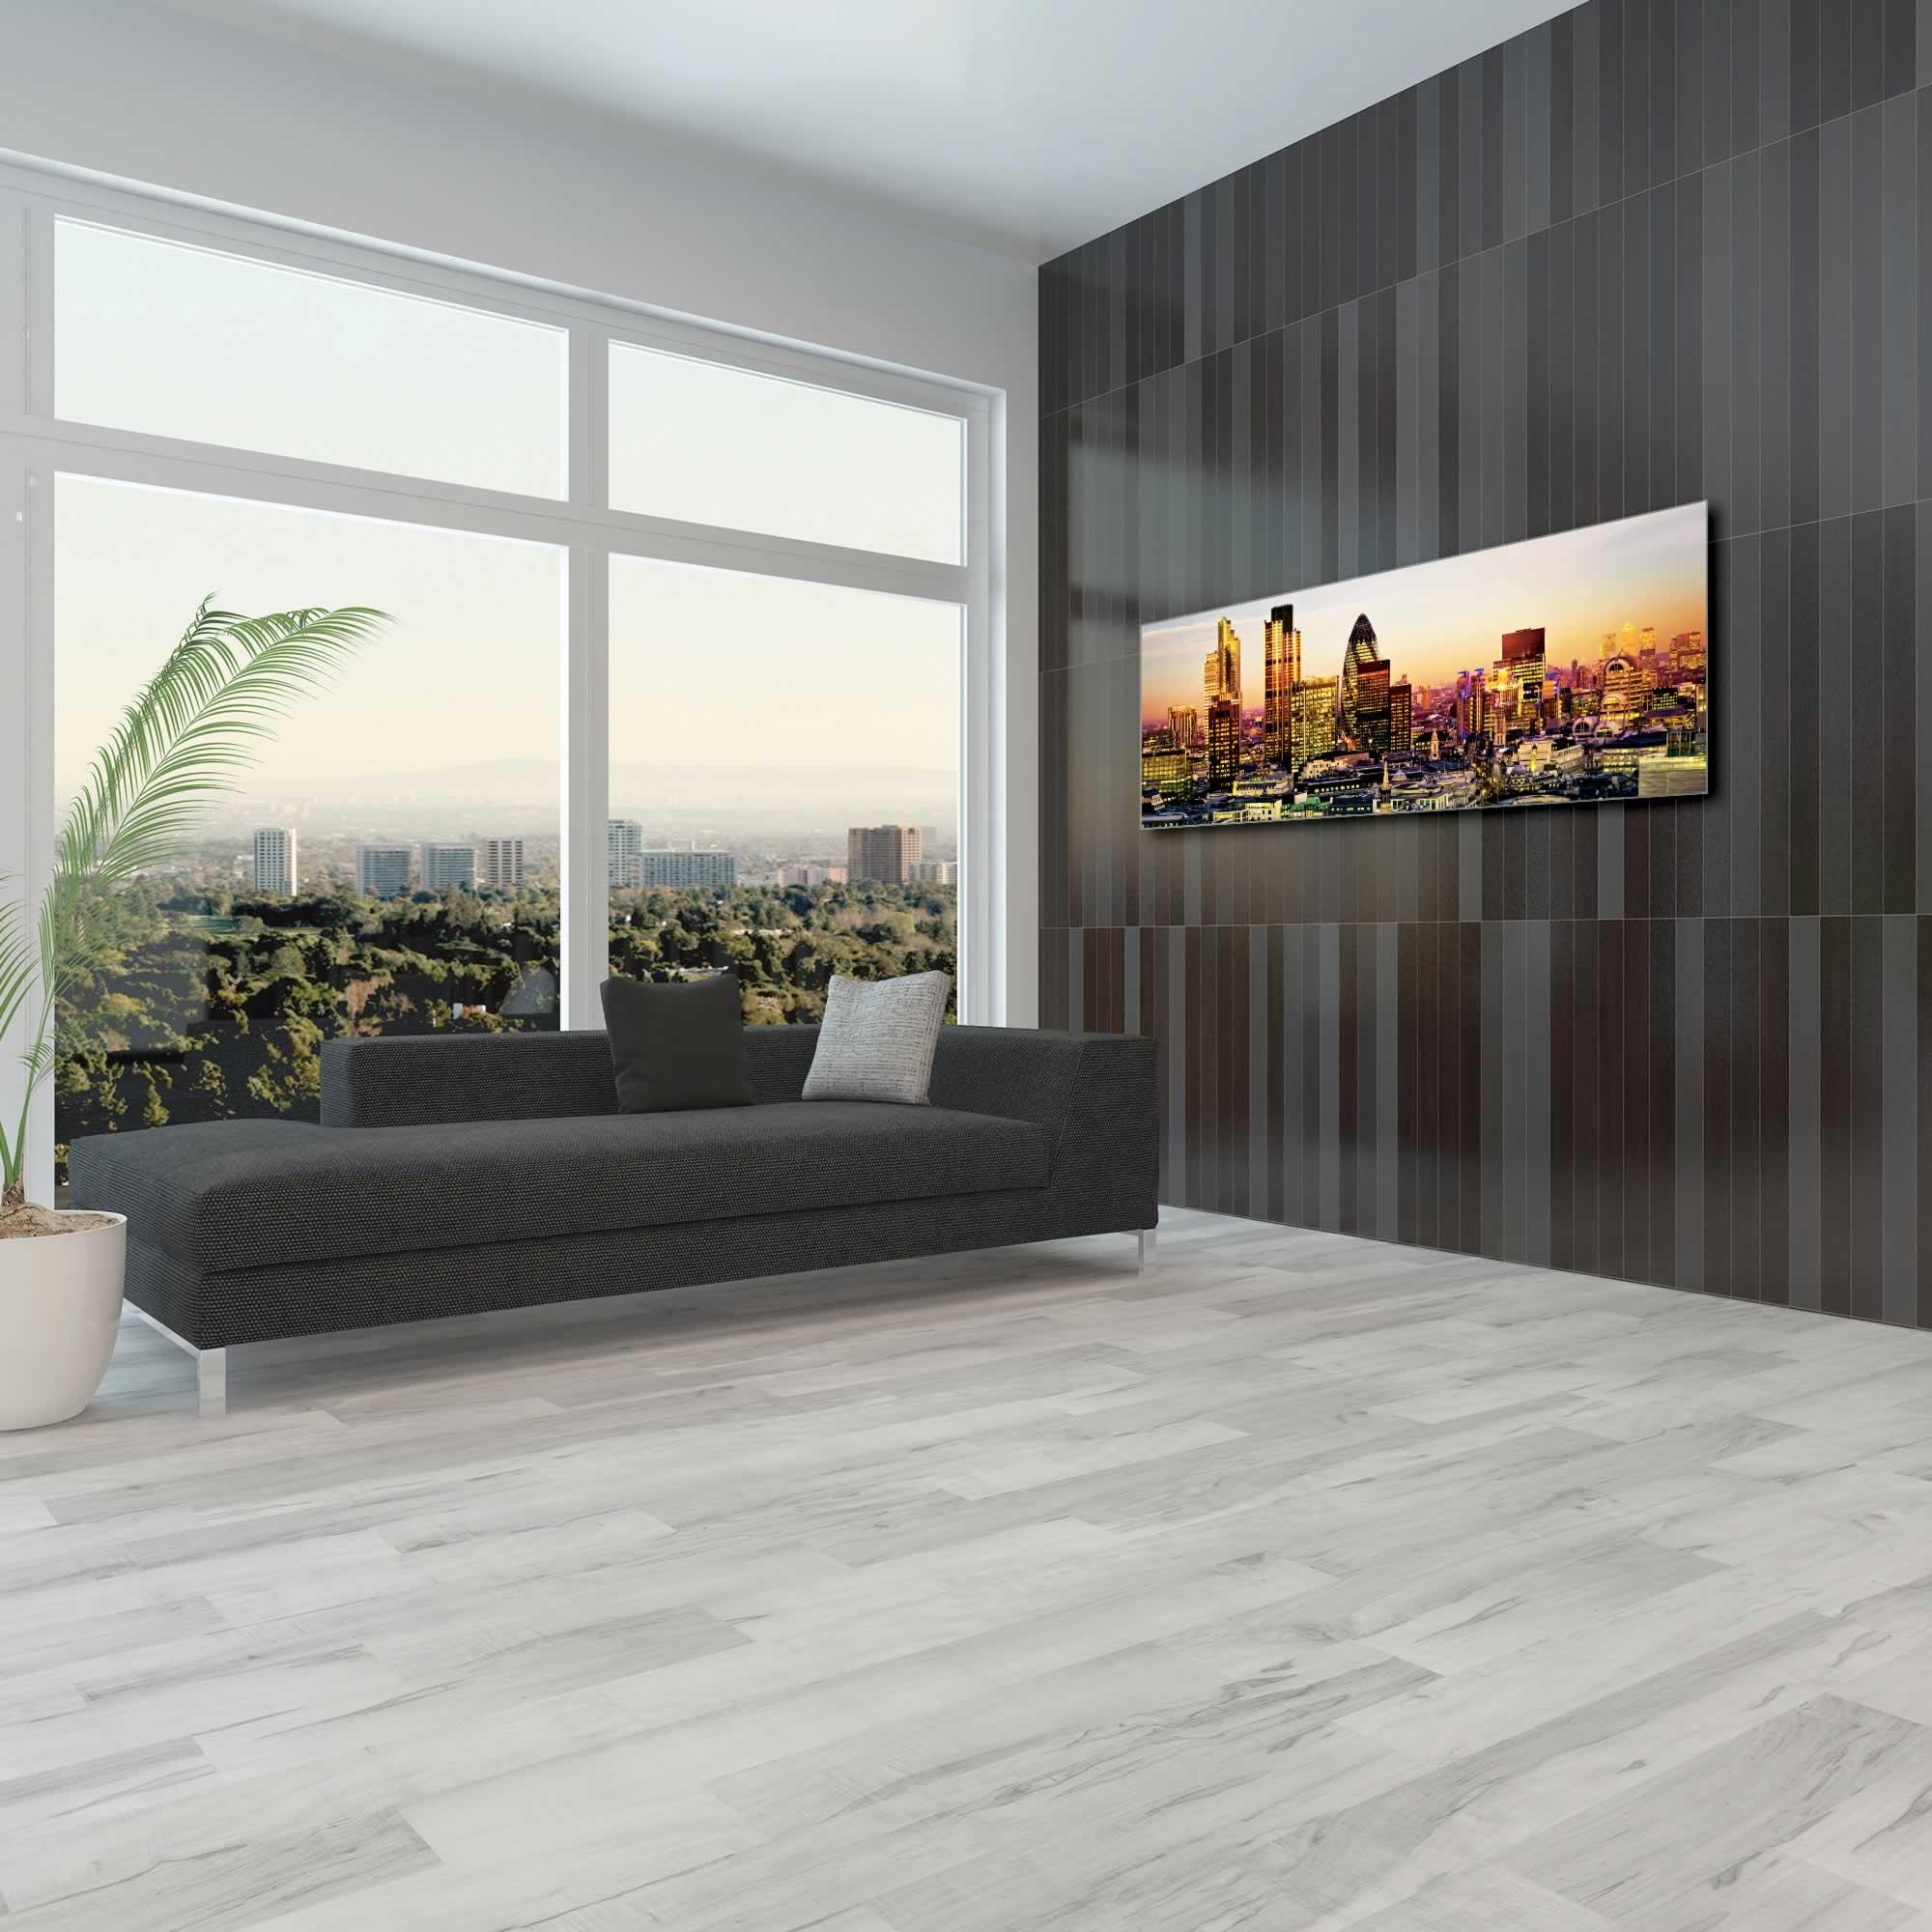 Modern London City Skyline - Urban Modern Art, Designer Home Decor, Cityscape Wall Artwork, Trendy Contemporary Art - Alternate View 1